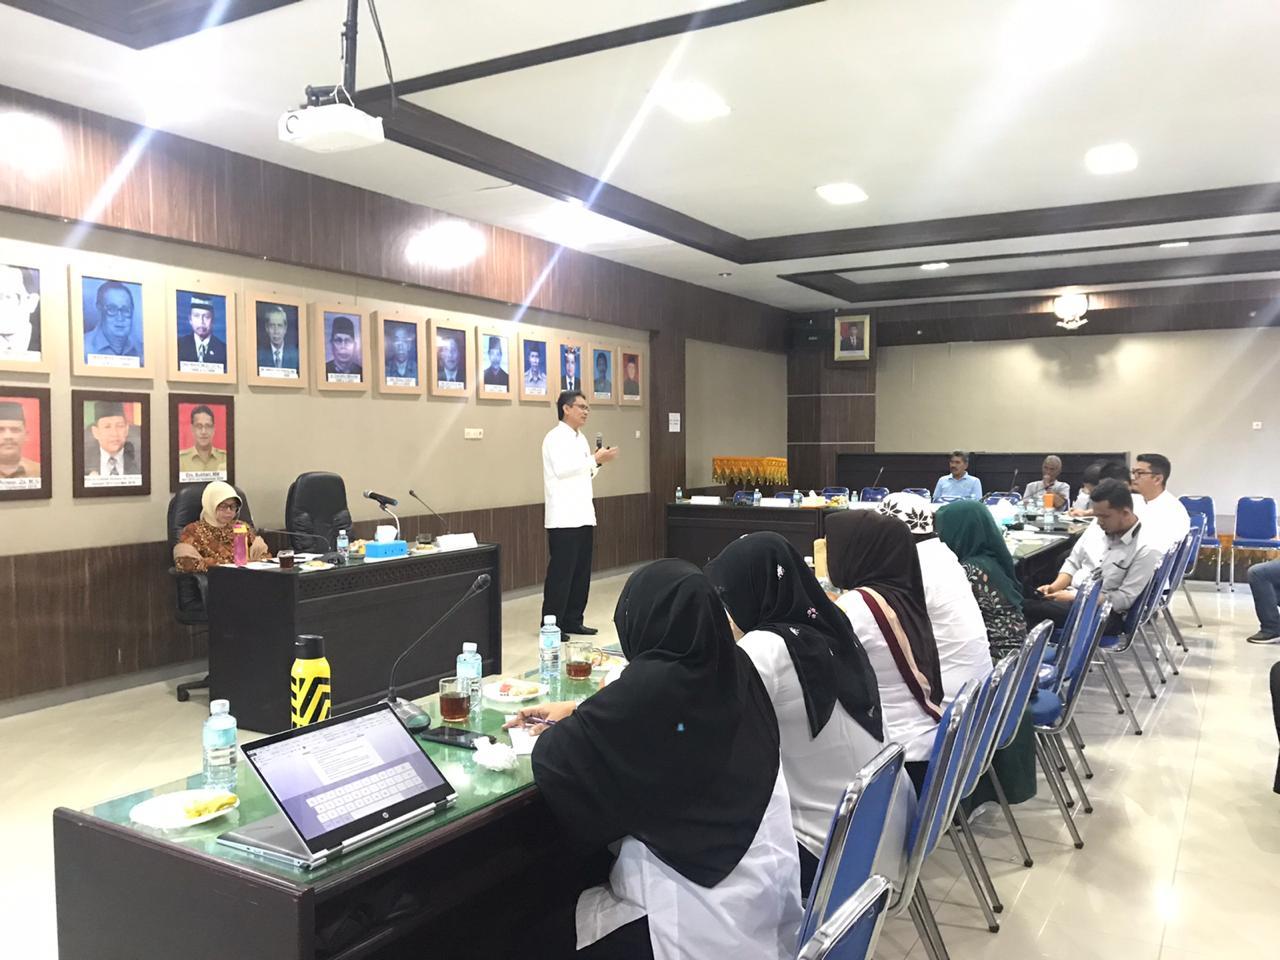 2020, Balai Syura dan Dinas Pemberdayaan Masyarakat Gampong Aceh akan Jalin Kerjasama